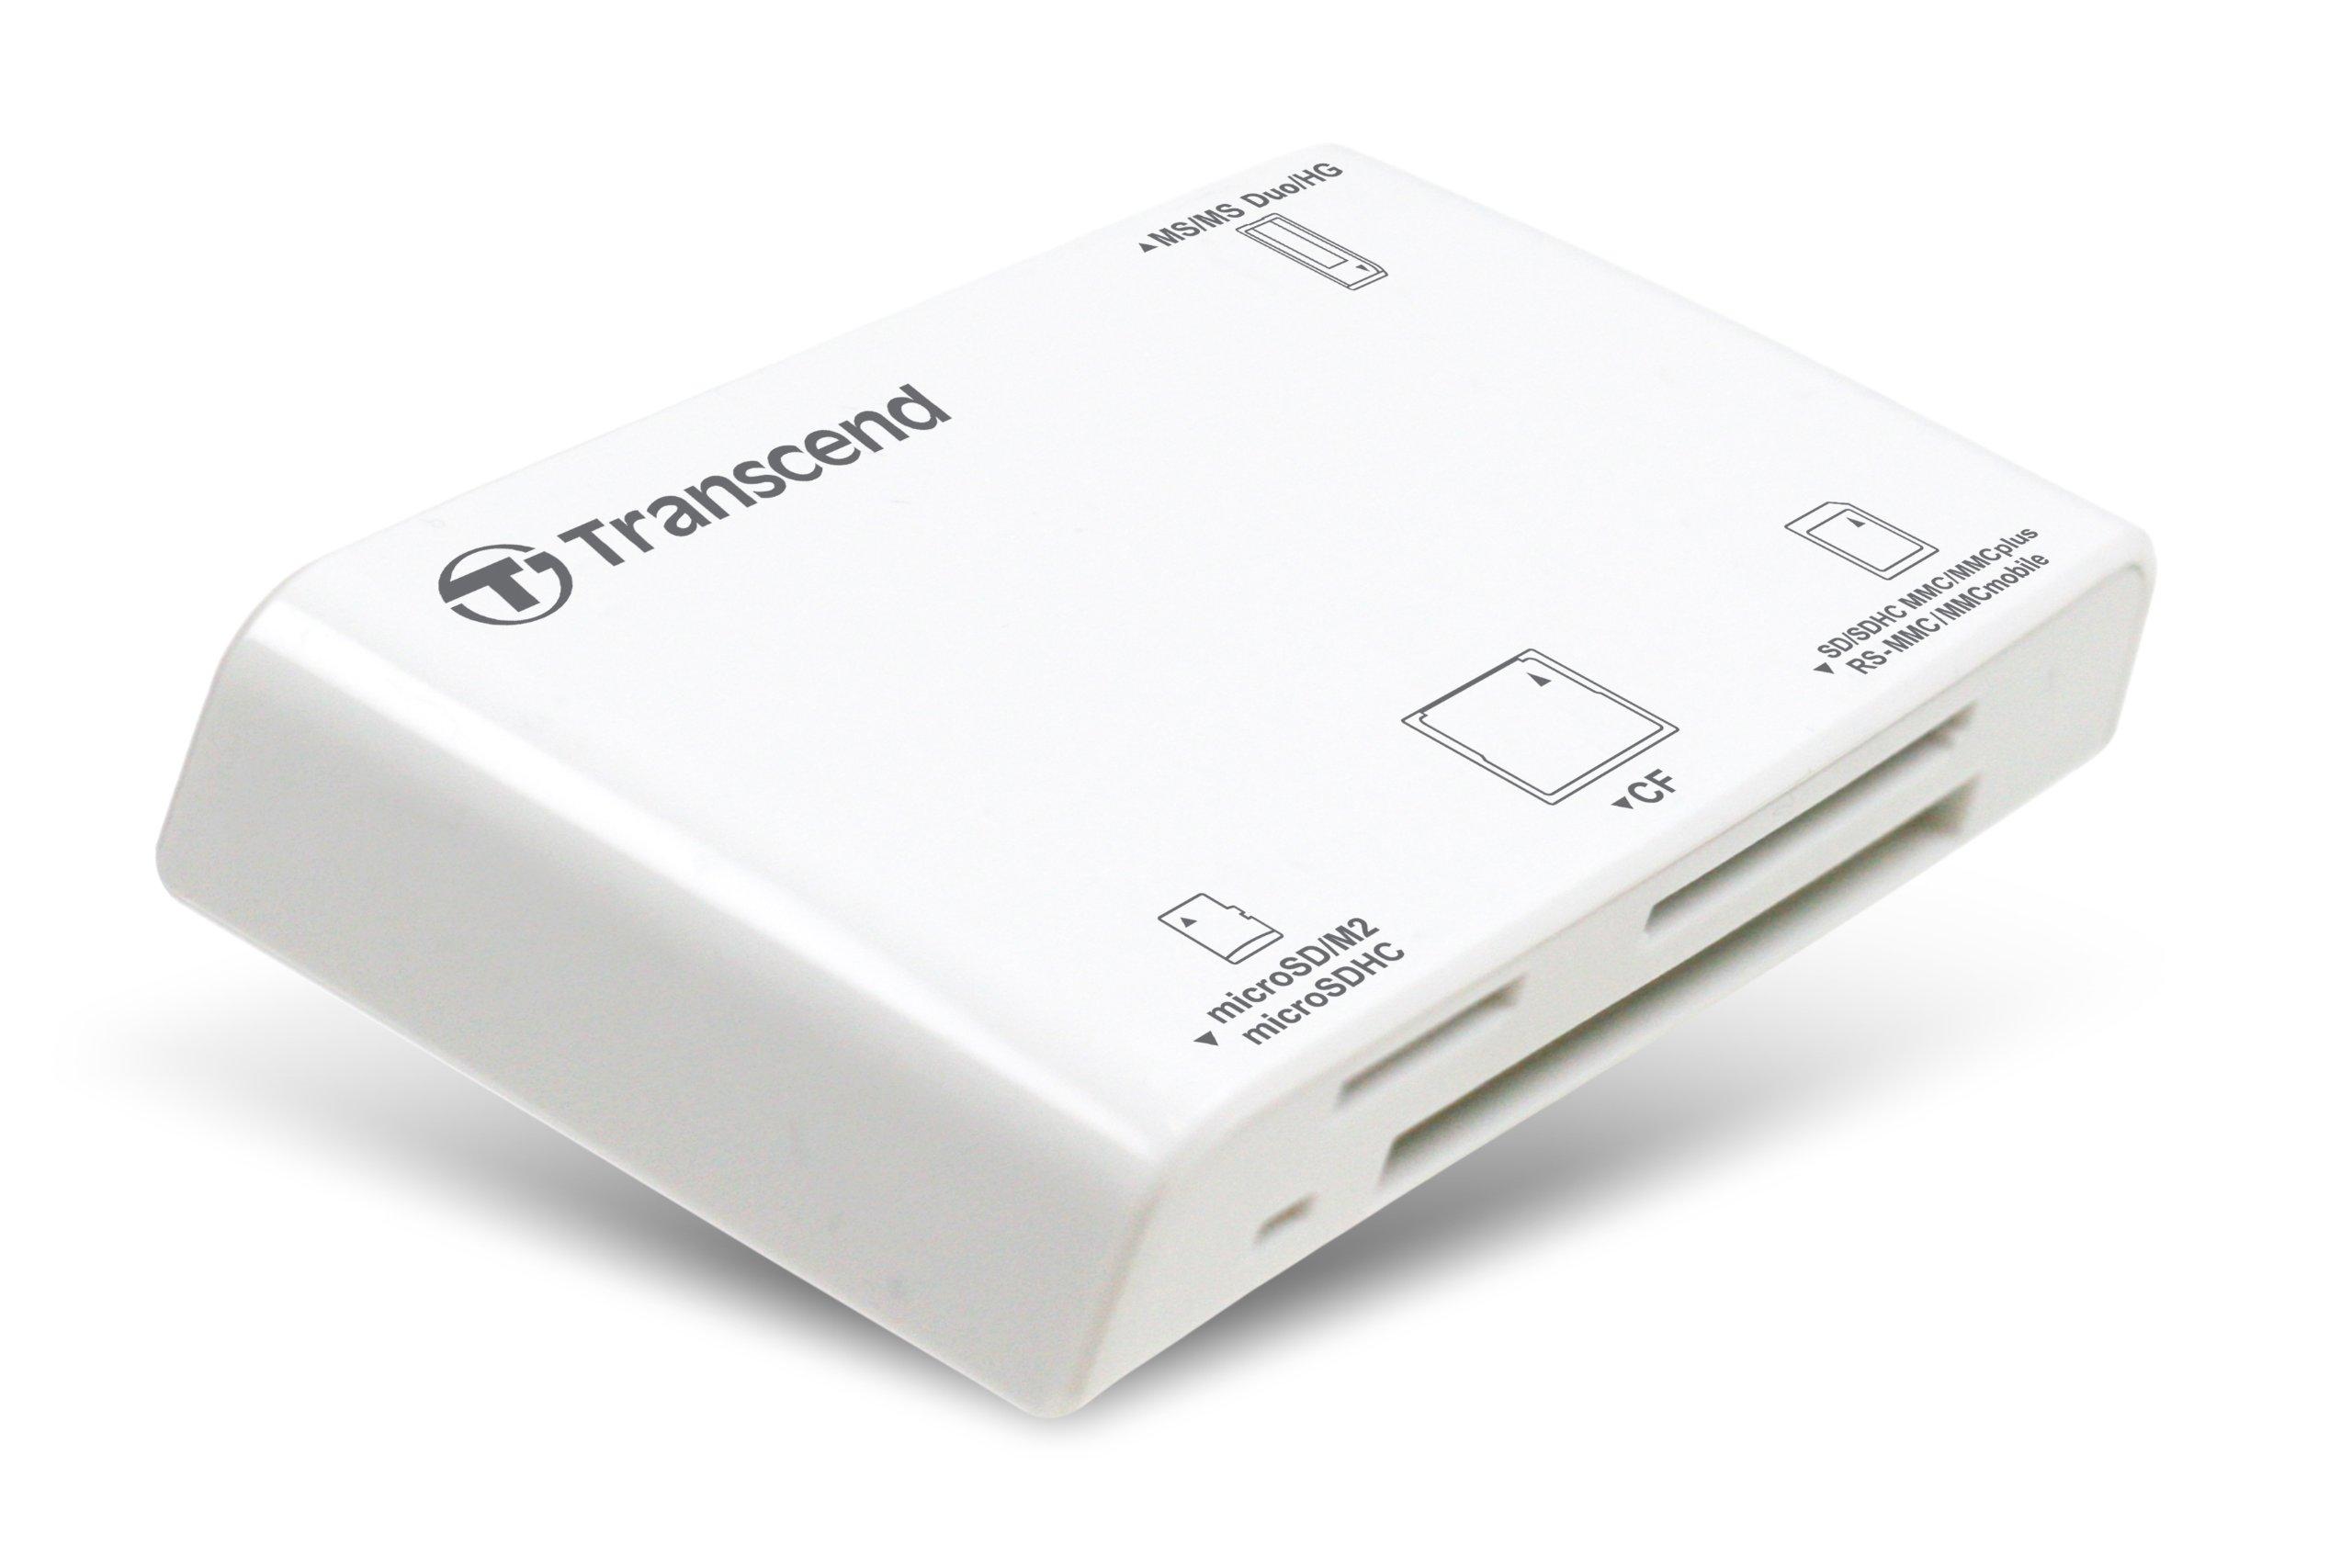 Transcend P8 15-in-1 USB 2.0 Flash Memory Card